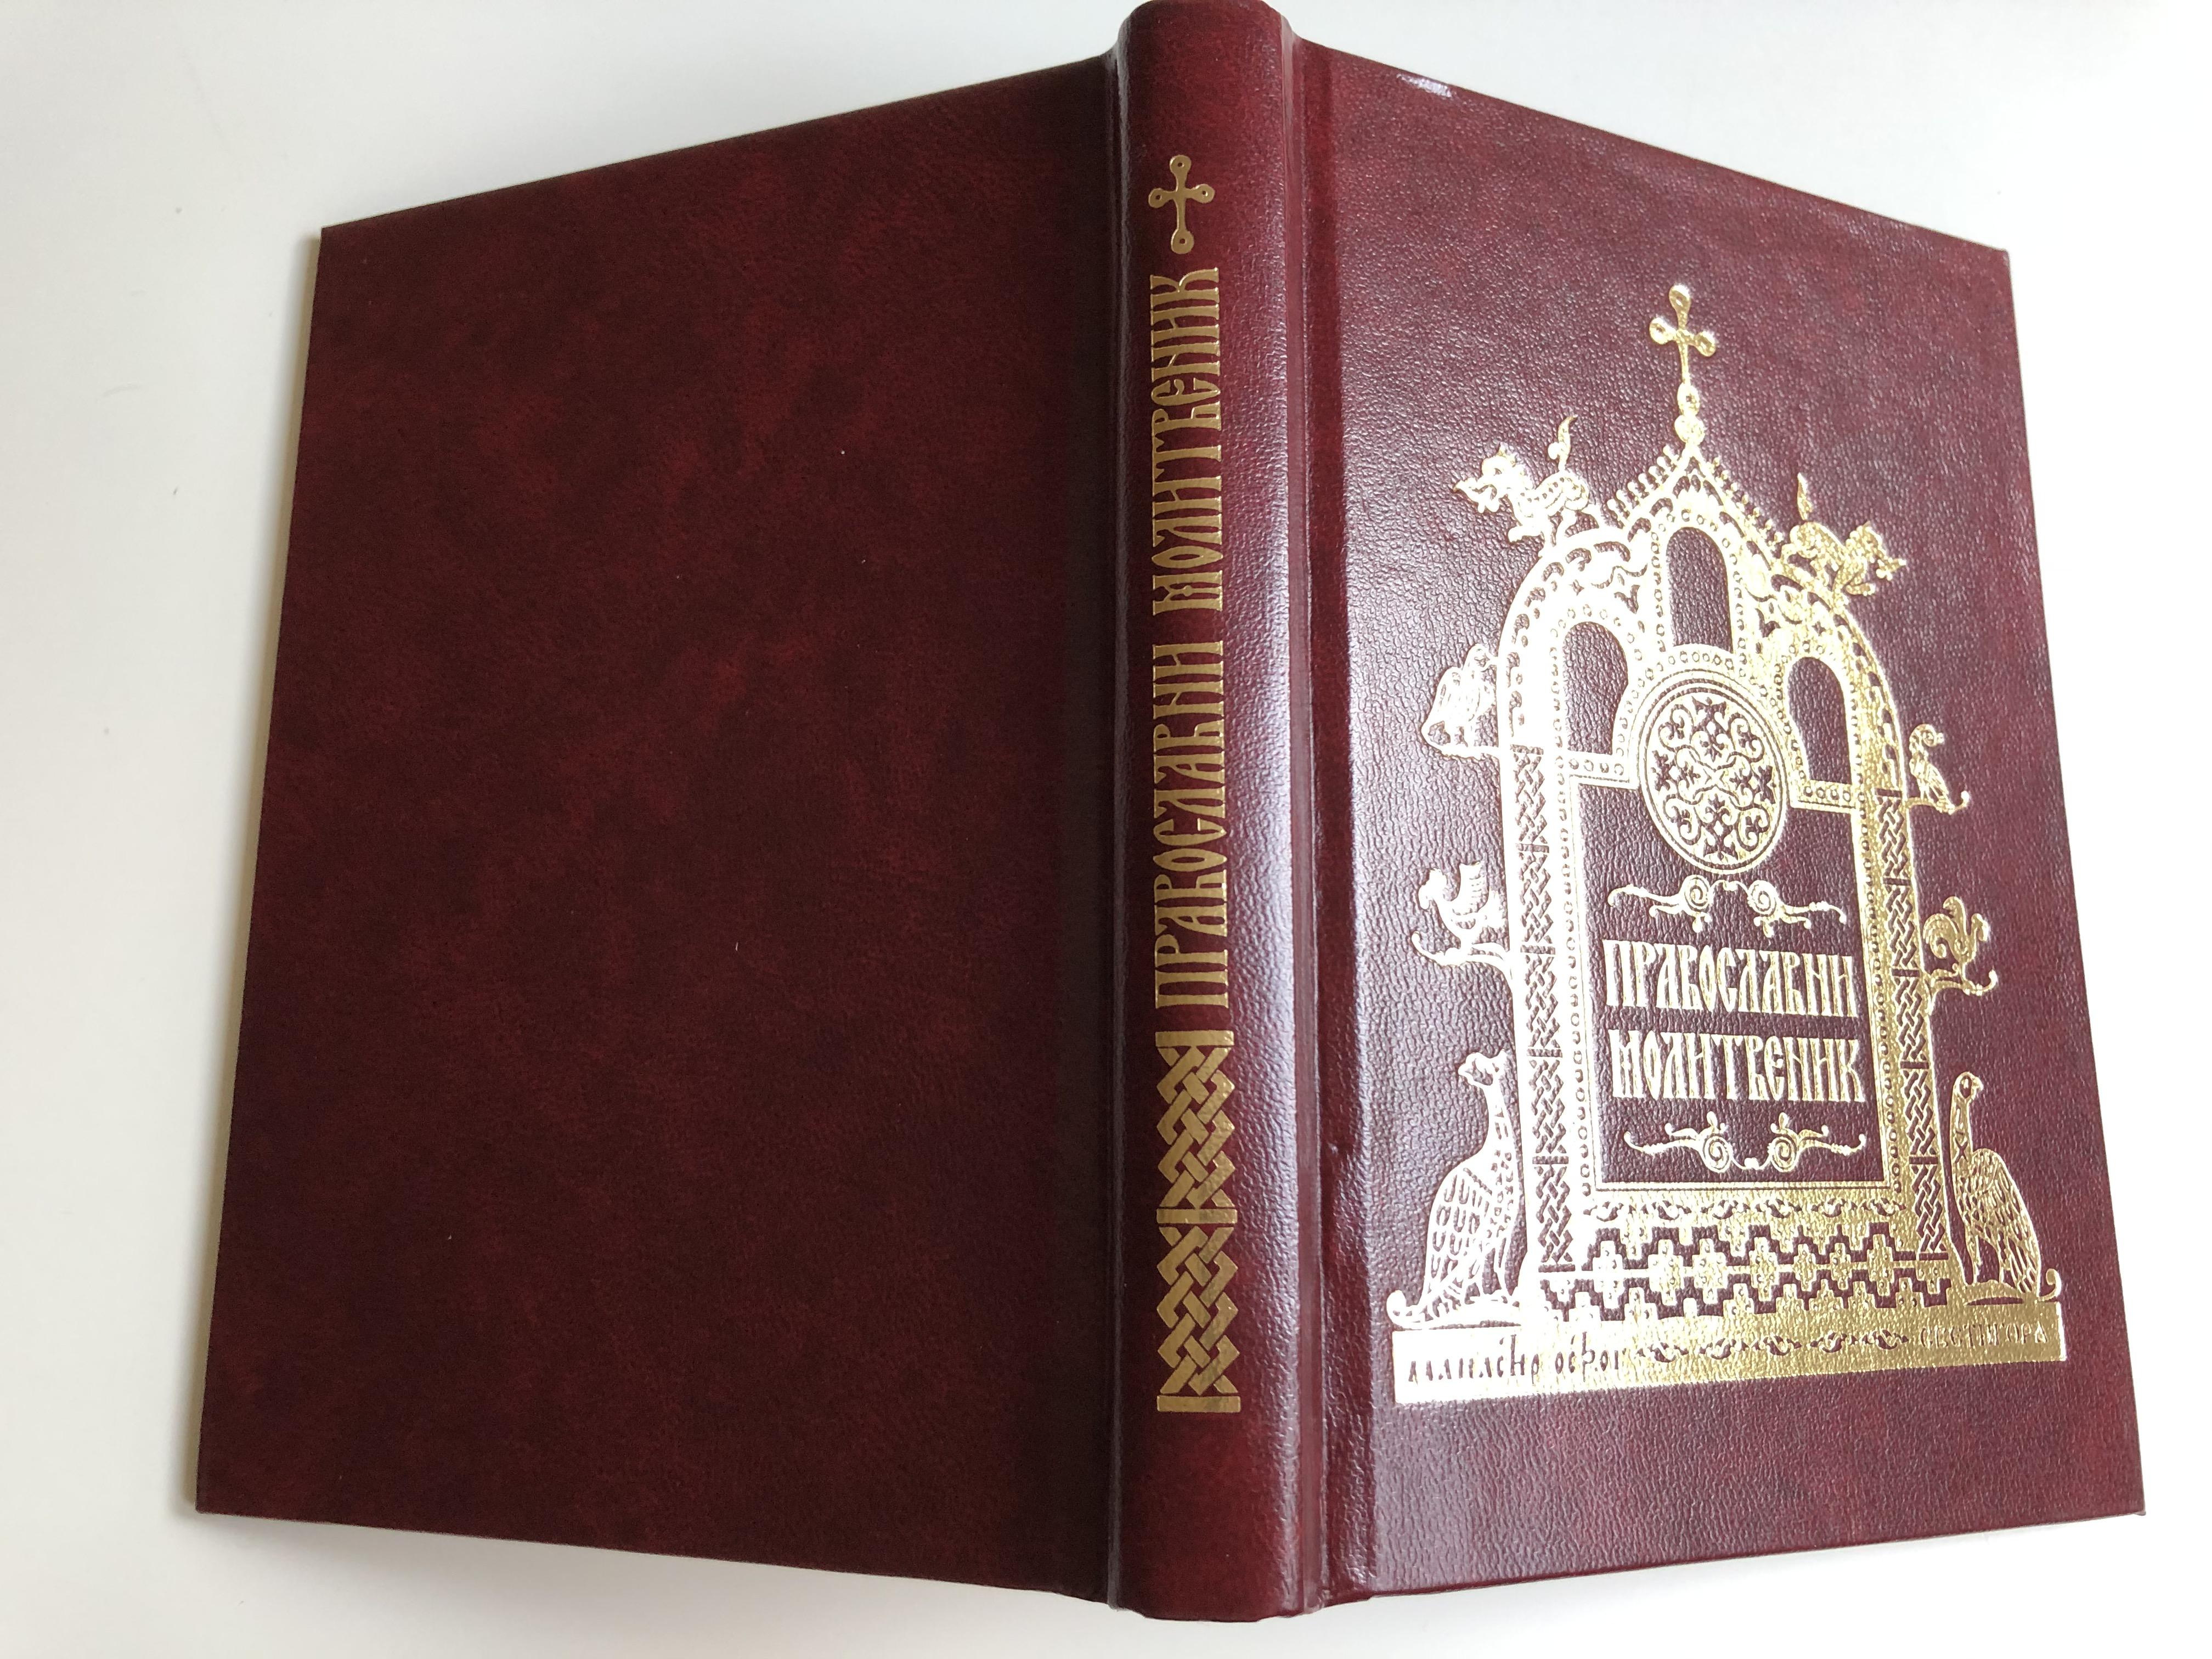 pravoslavni-molitvenik-small-serbian-orthodox-prayer-book-2015-14.jpg